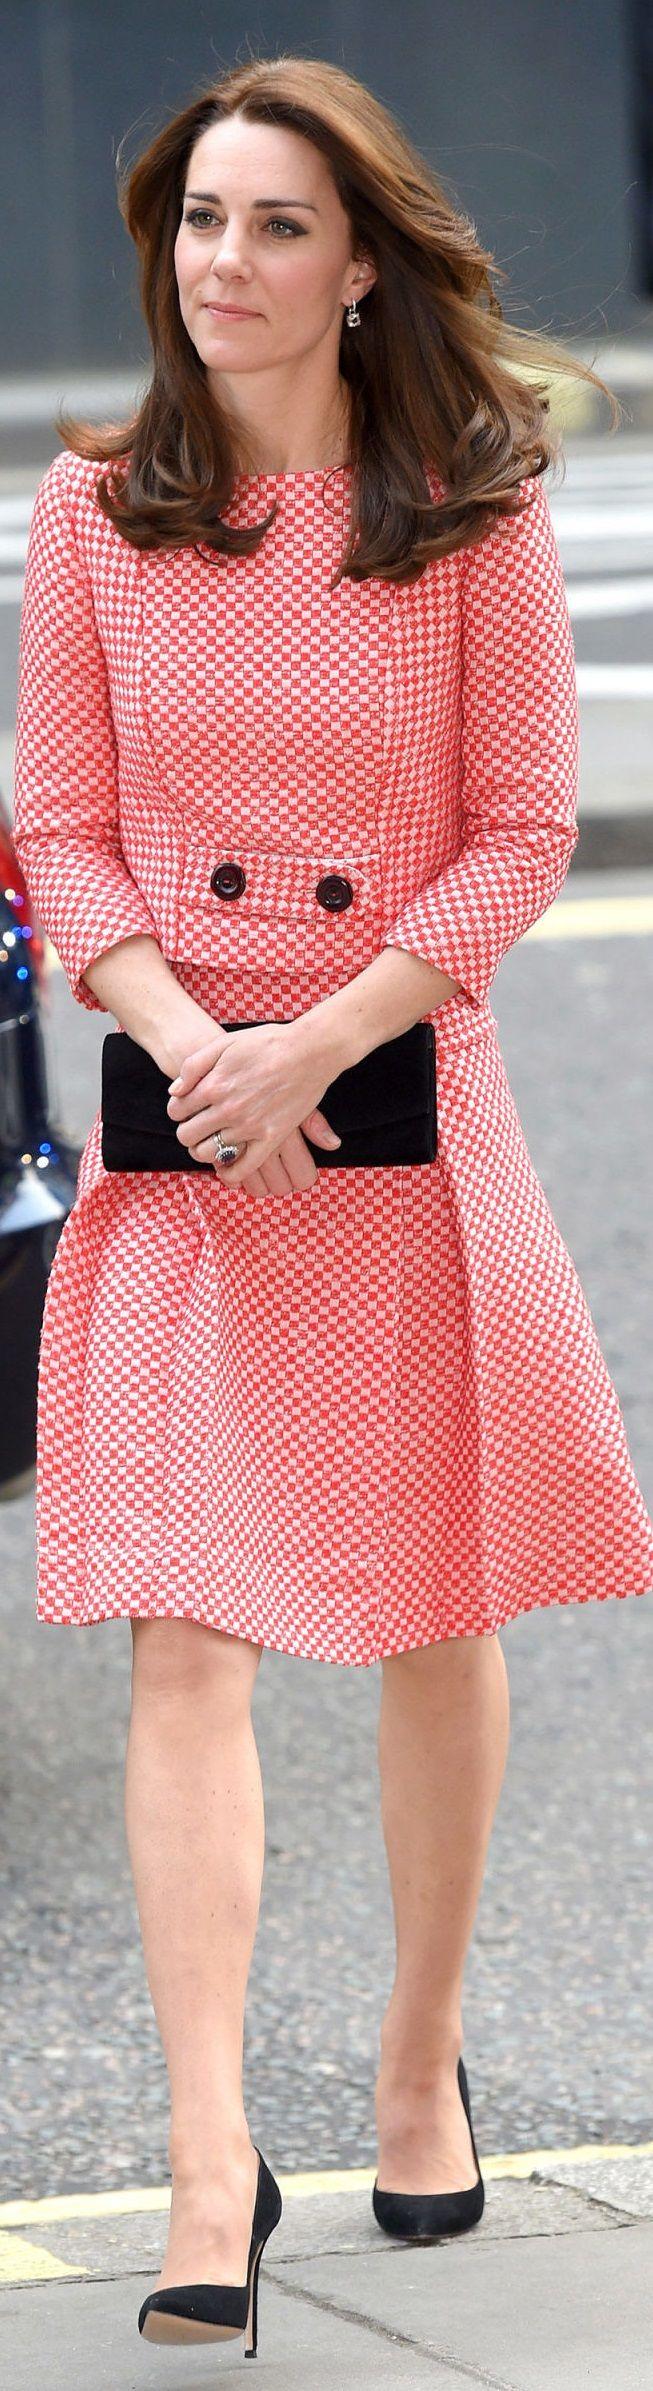 683 best The Royals images on Pinterest | Princess diana, Princesses ...